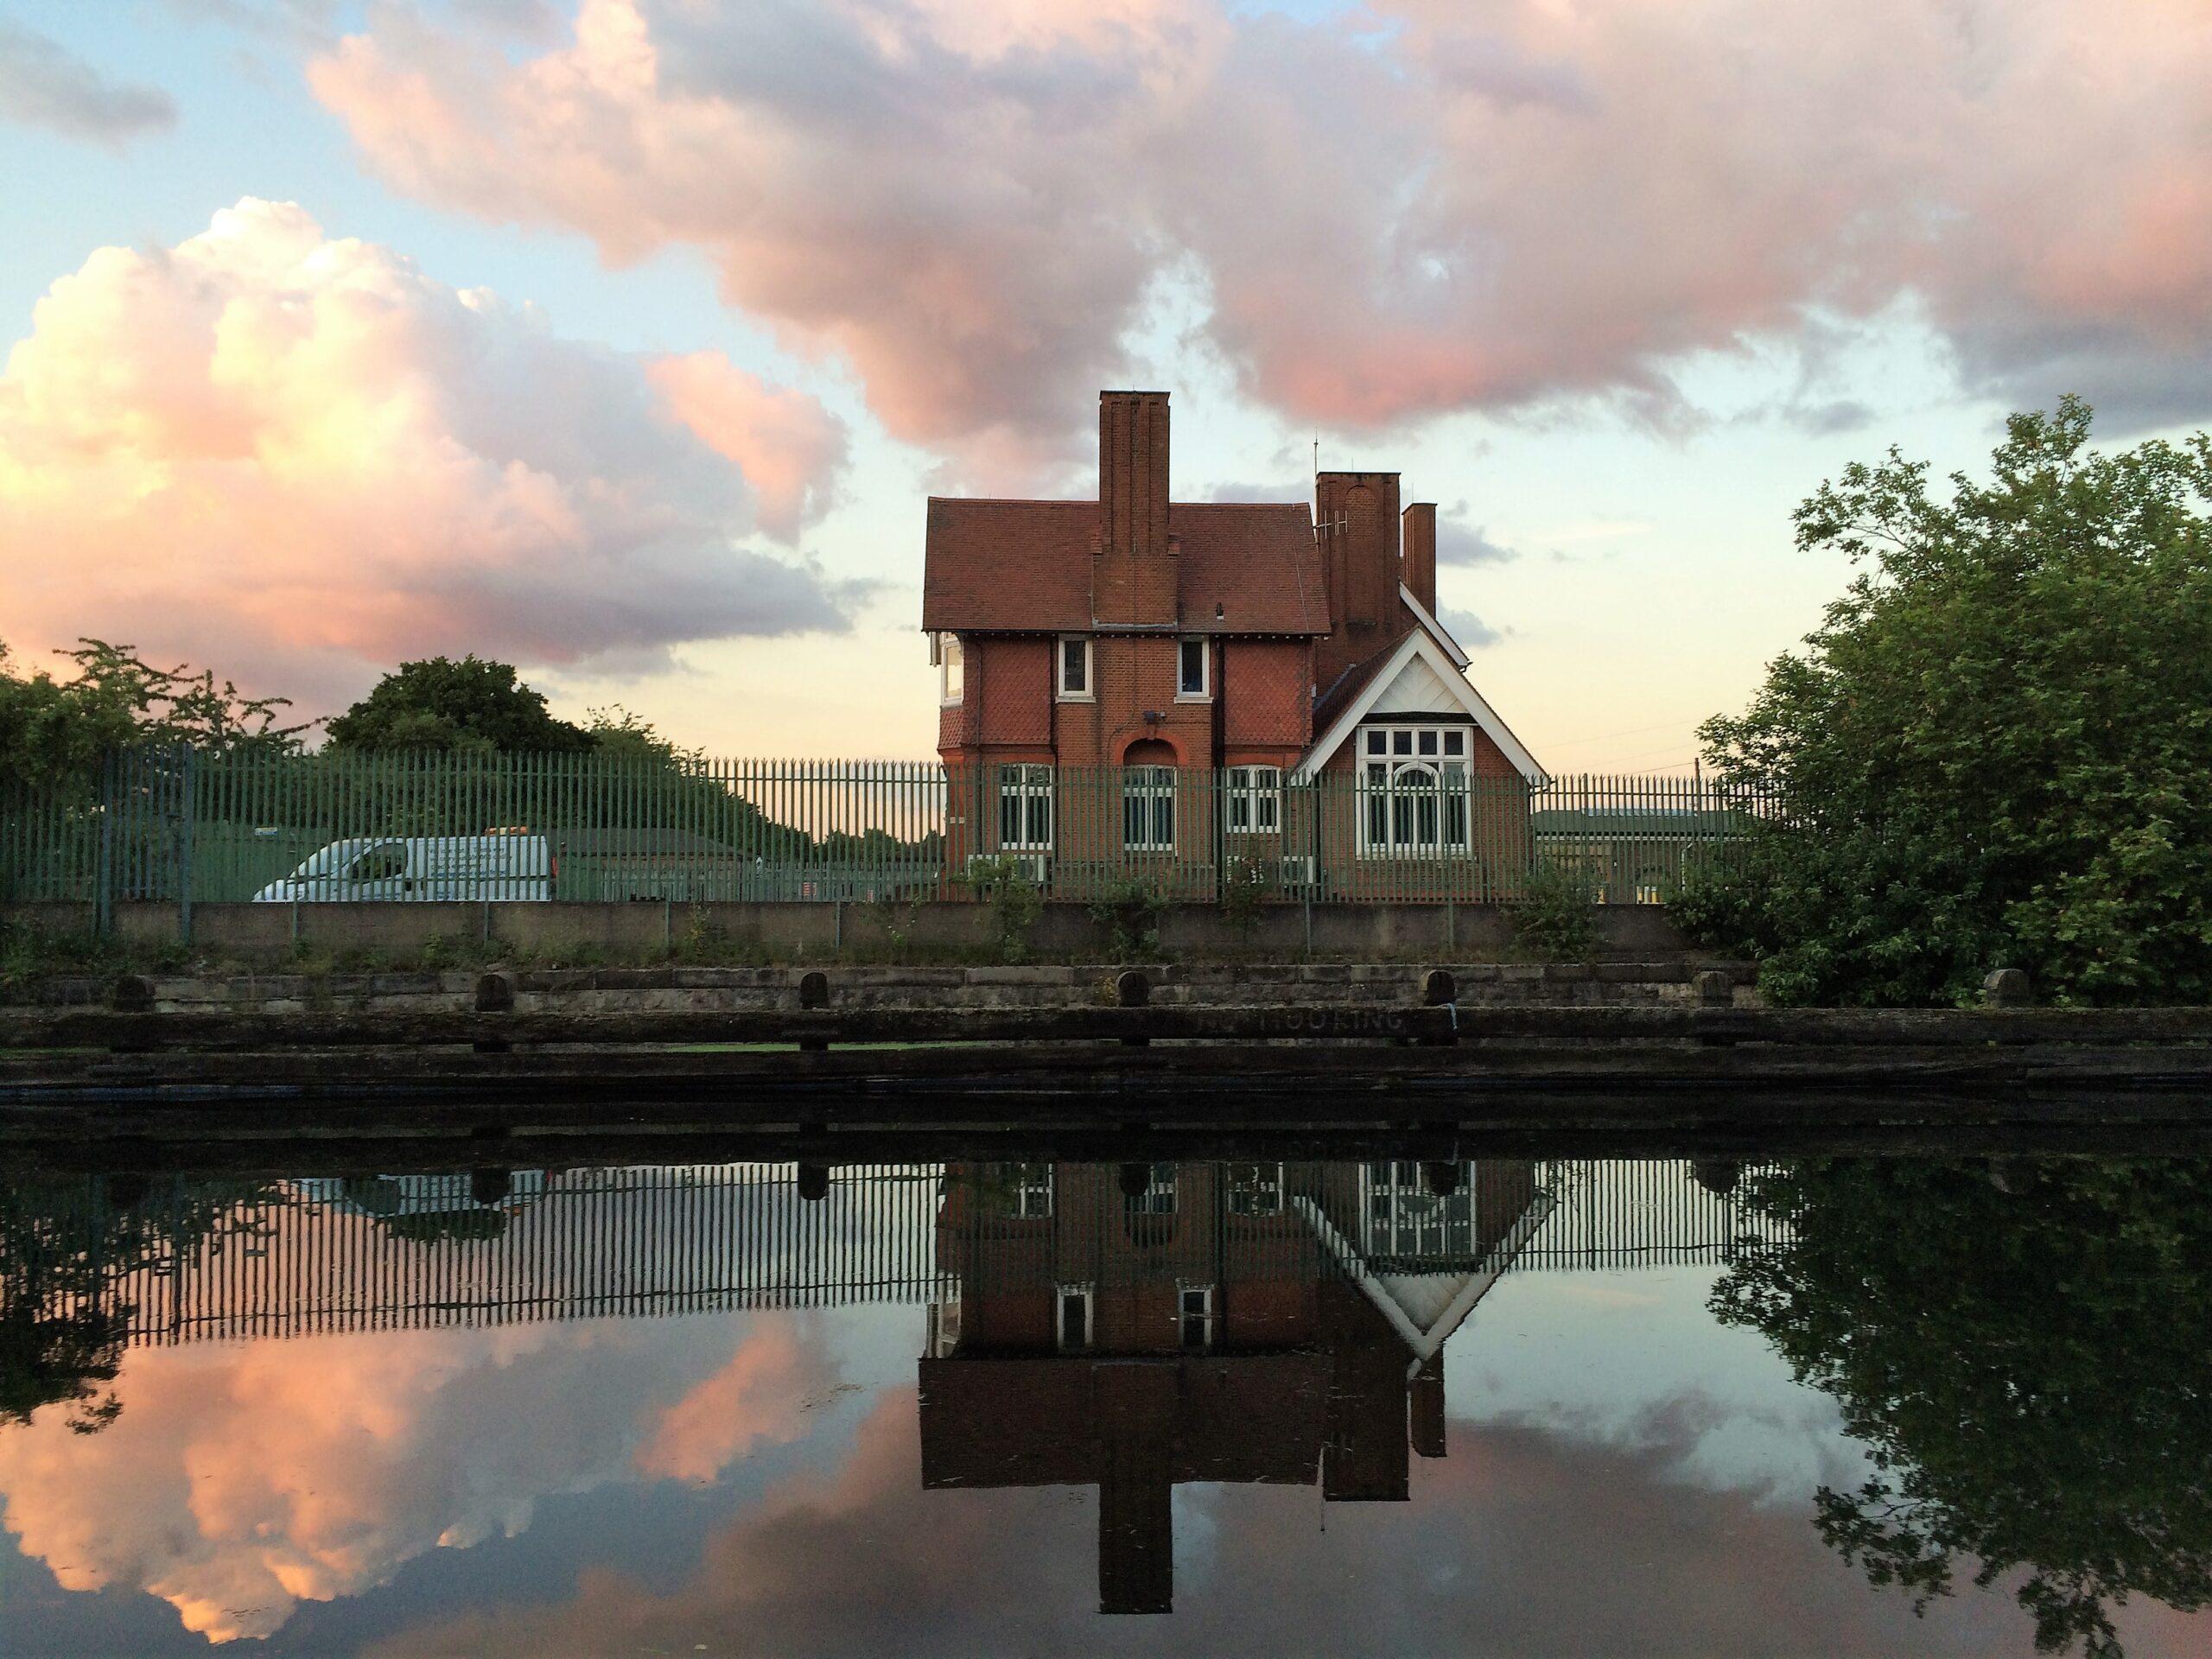 If Rene Magritte painted NE London